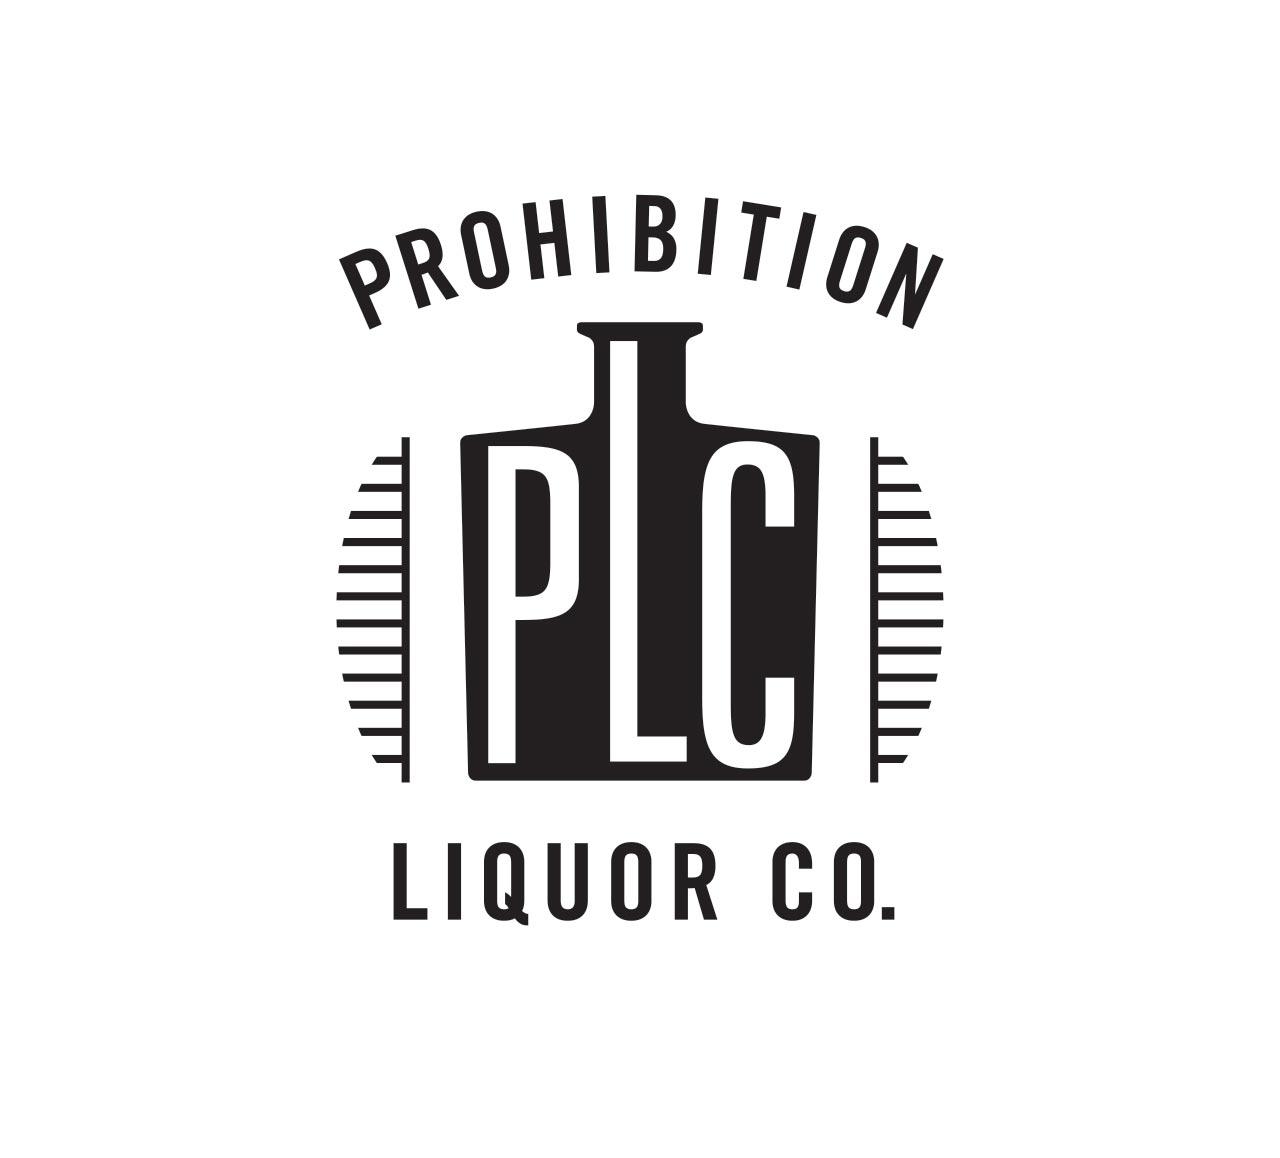 Prohibition Liquor Co logo